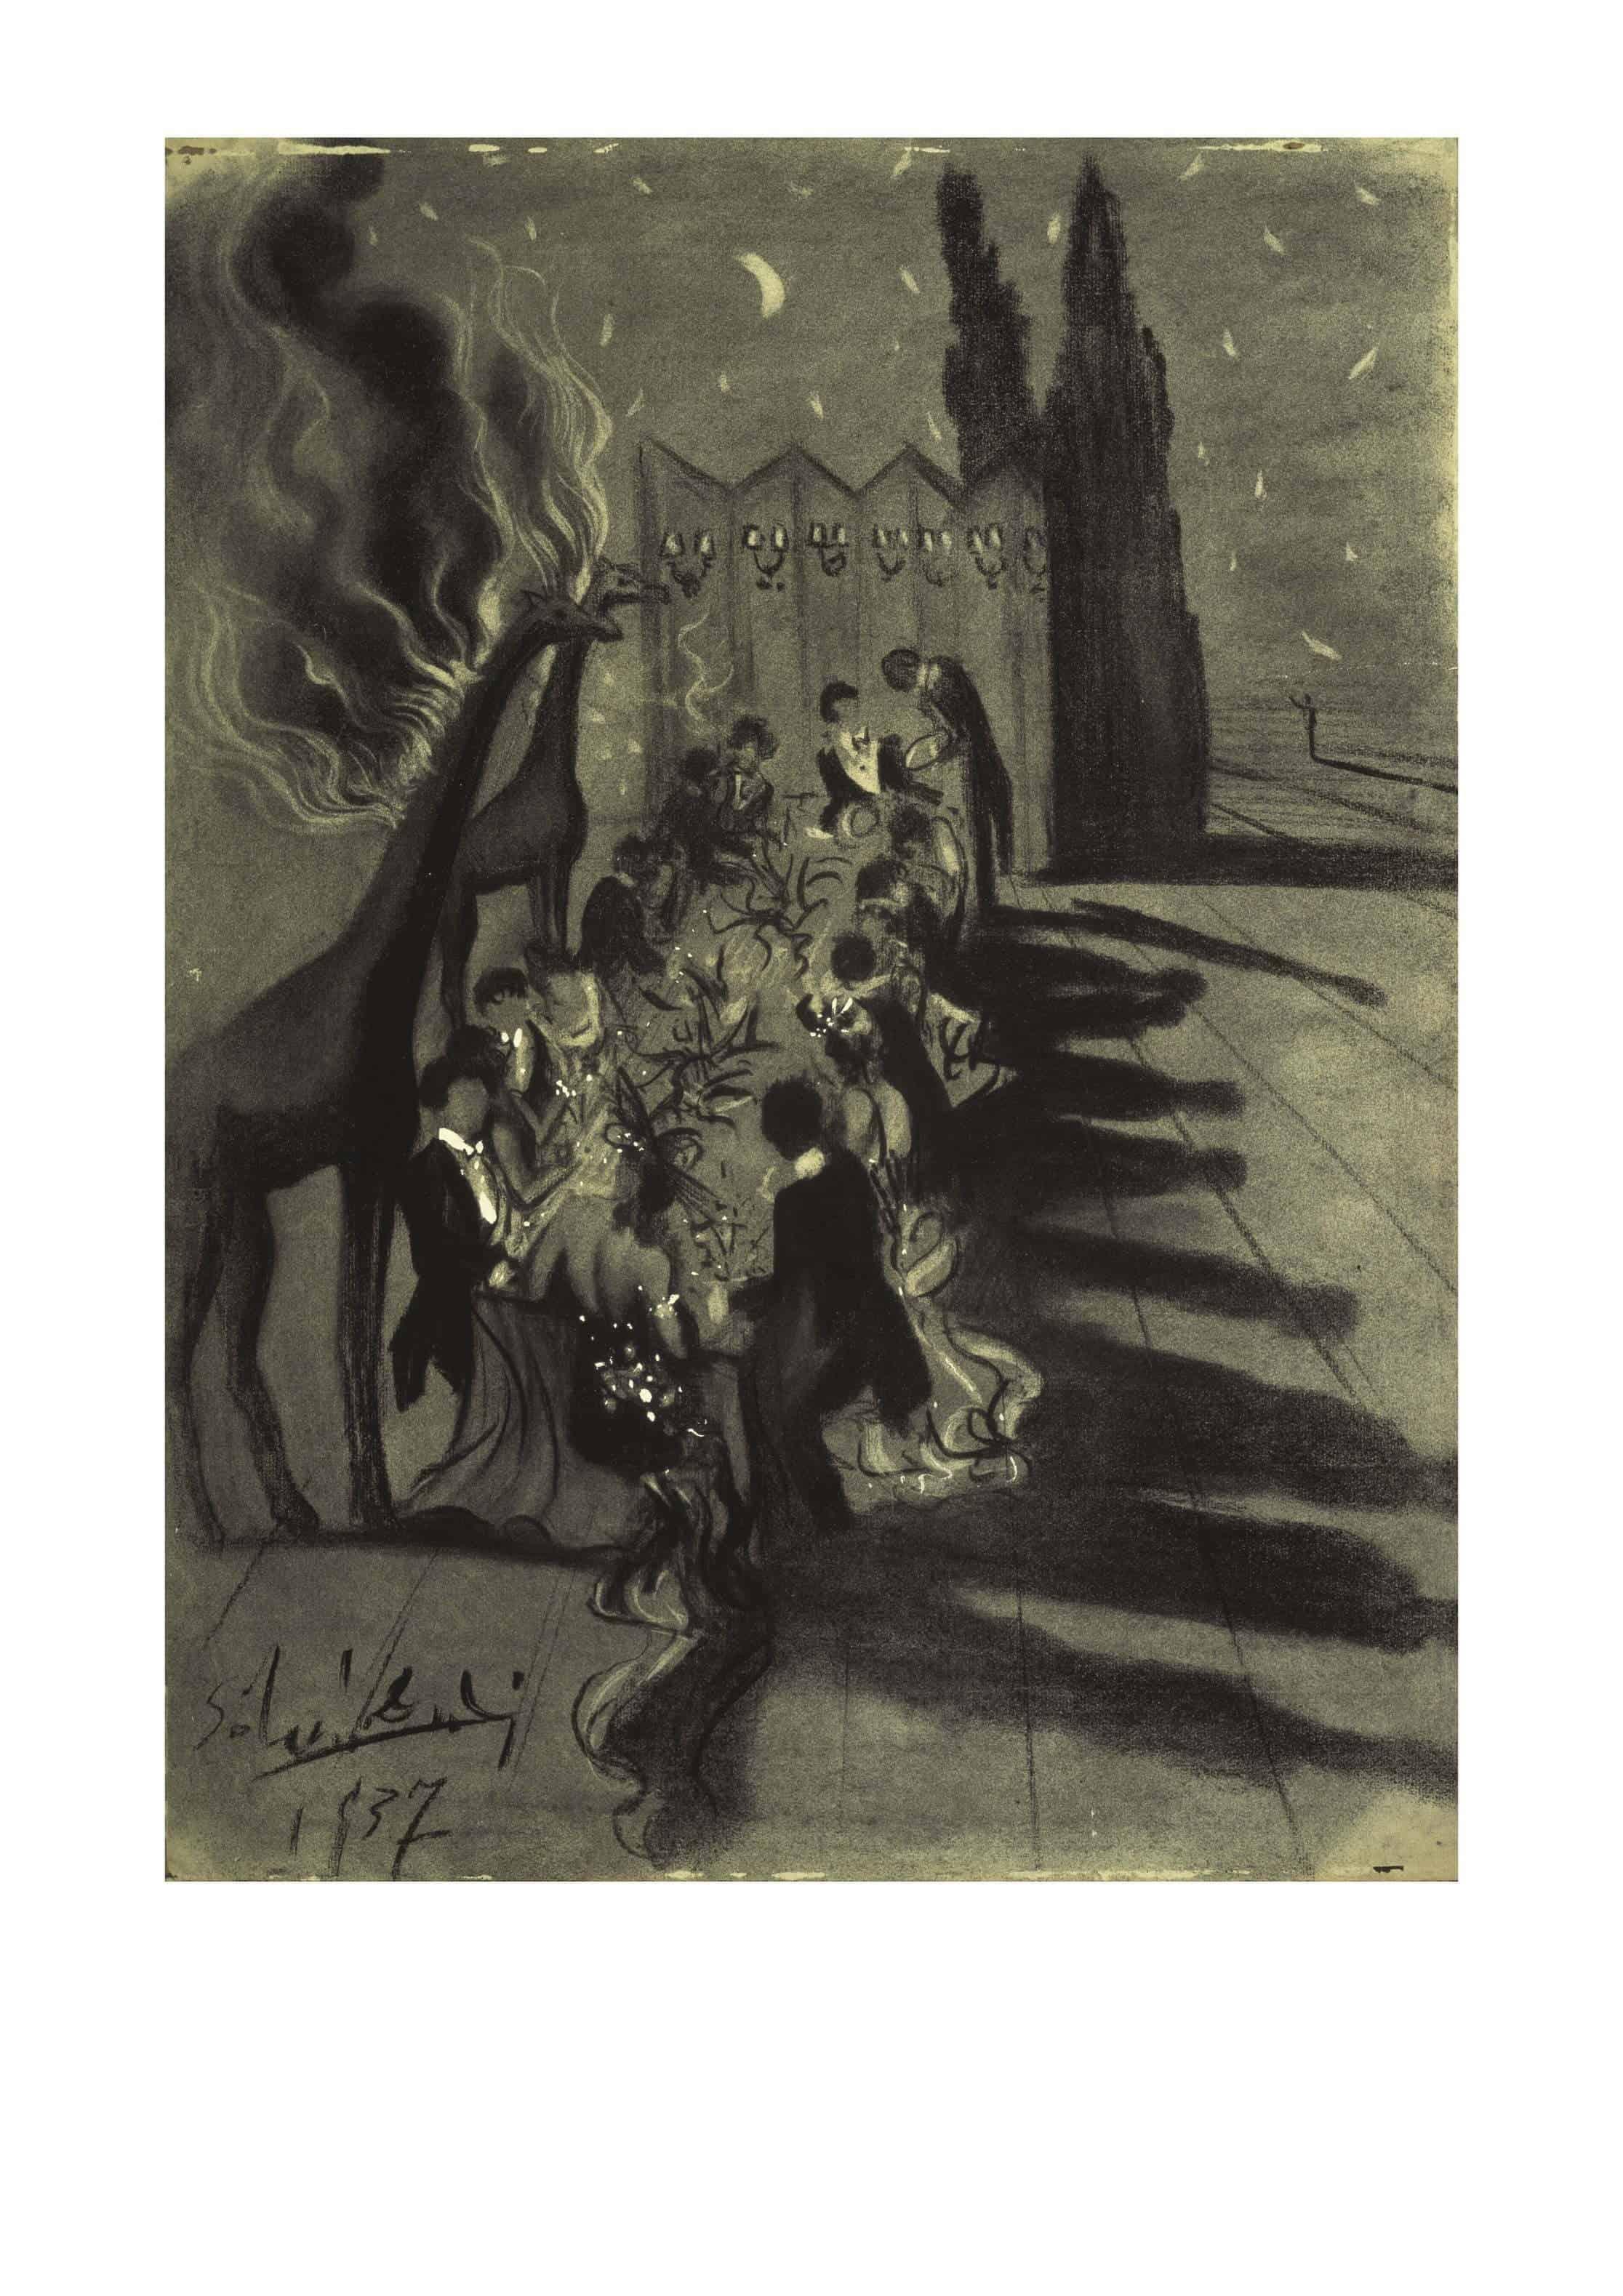 Salvador DALÍ Dinner in the Desert lit by Burning Giraffes Dîner dans le désert éclairé par les girafes en feu Avondmaal in de woestijn verlicht door brandende giraffen 1937 Charcoal on paper 61,5 x 45,7 cm Collection of The Dali Museum, St. Petersburg FL © Salvador Dalí, Fundació Gala-Salvador Dalí, (corresponding Rights Society), 2019